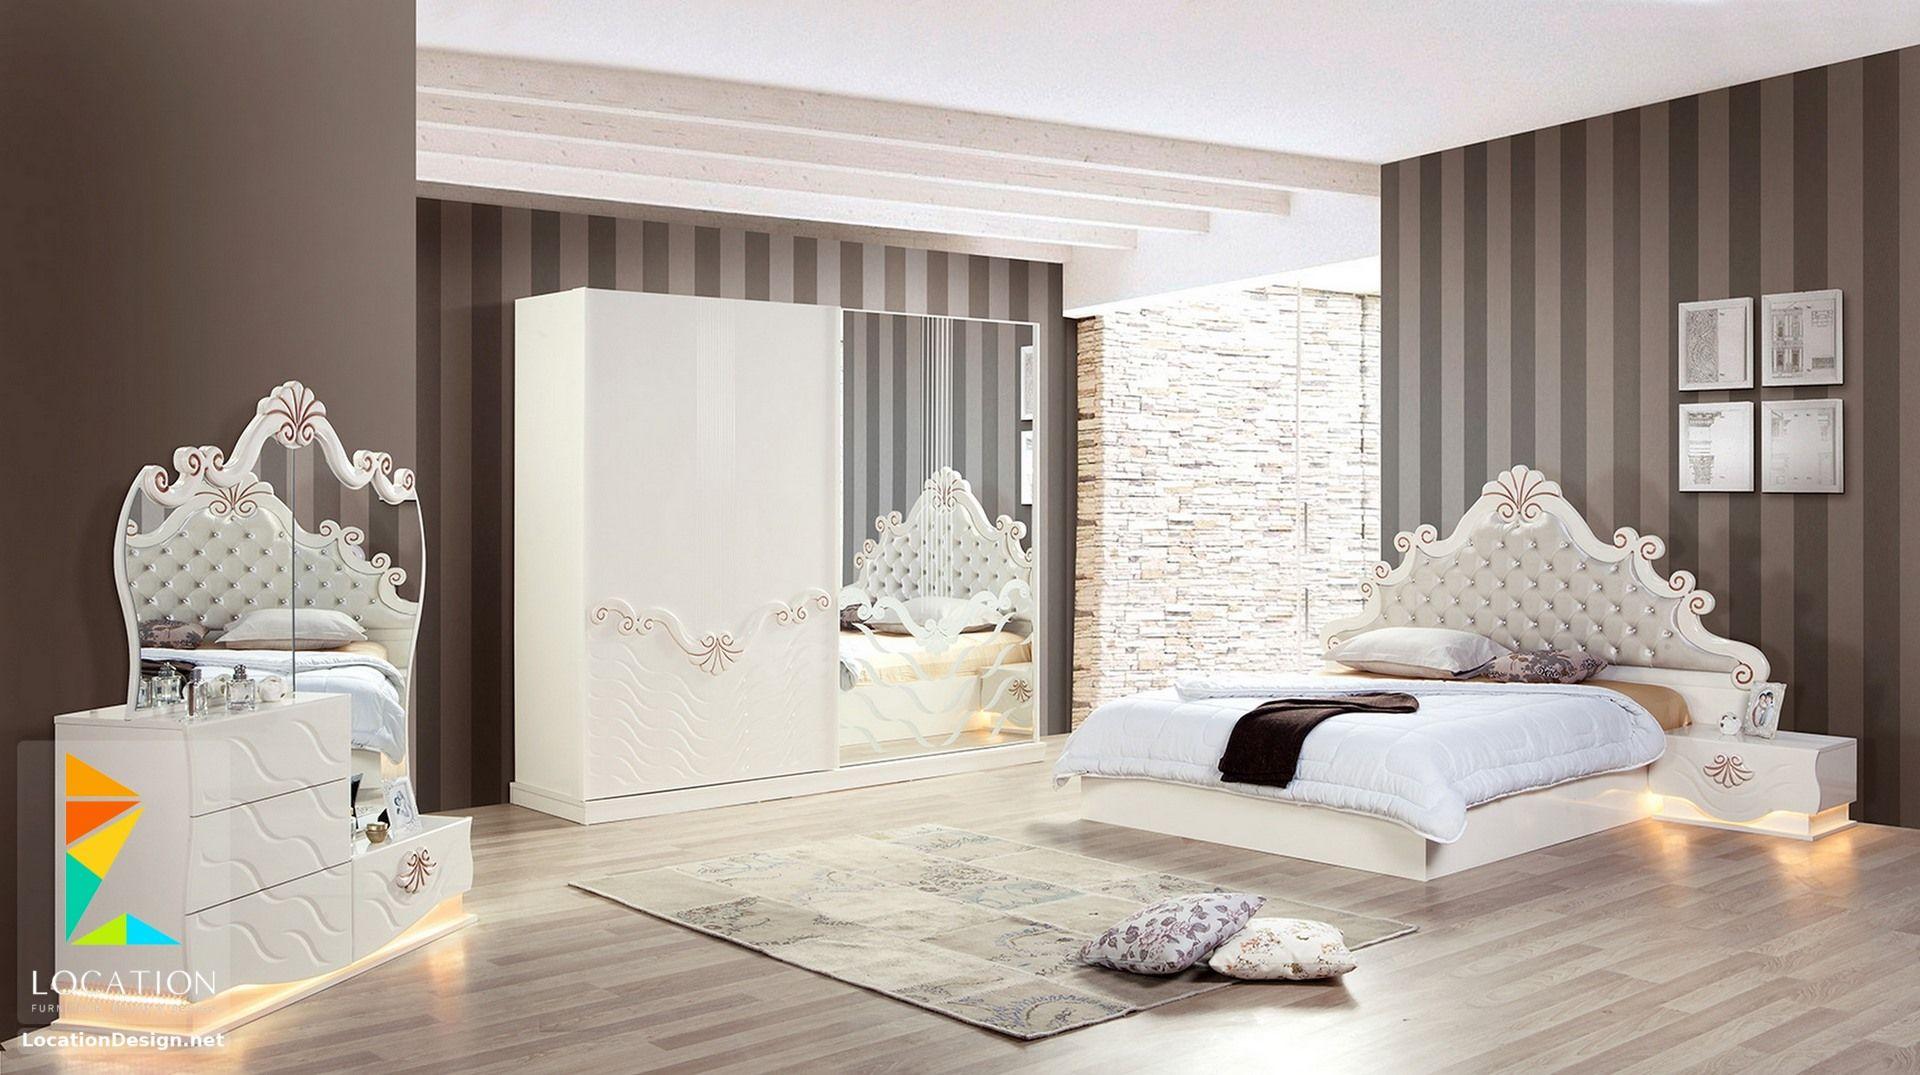 احدث موديلات و اشكال غرف نوم تركي 2019 2020 Luxury Furniture Sofa Bedroom Furniture Design Bedroom Bed Design